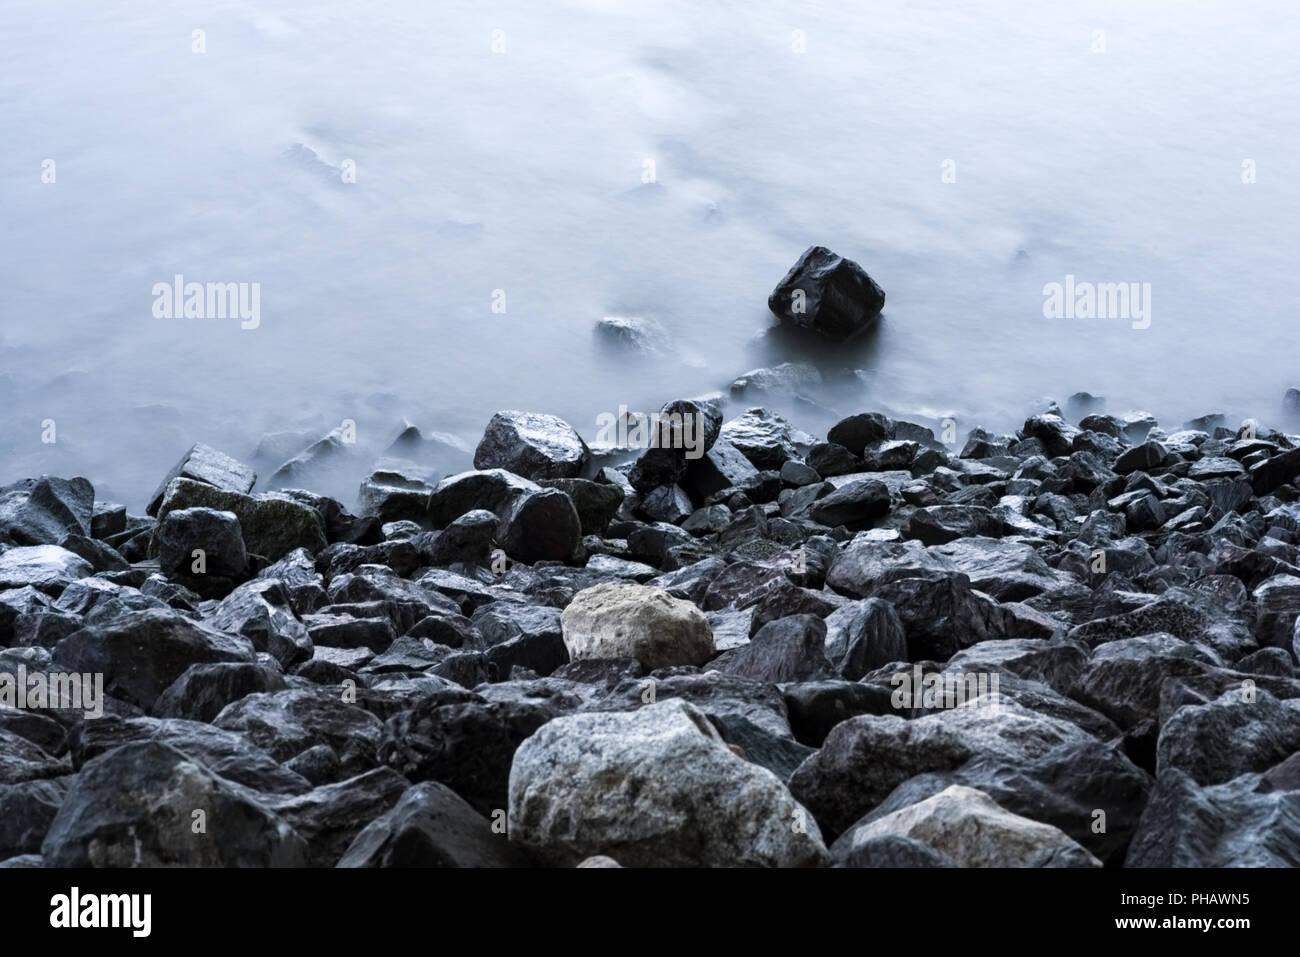 Same stone shore - Stock Image